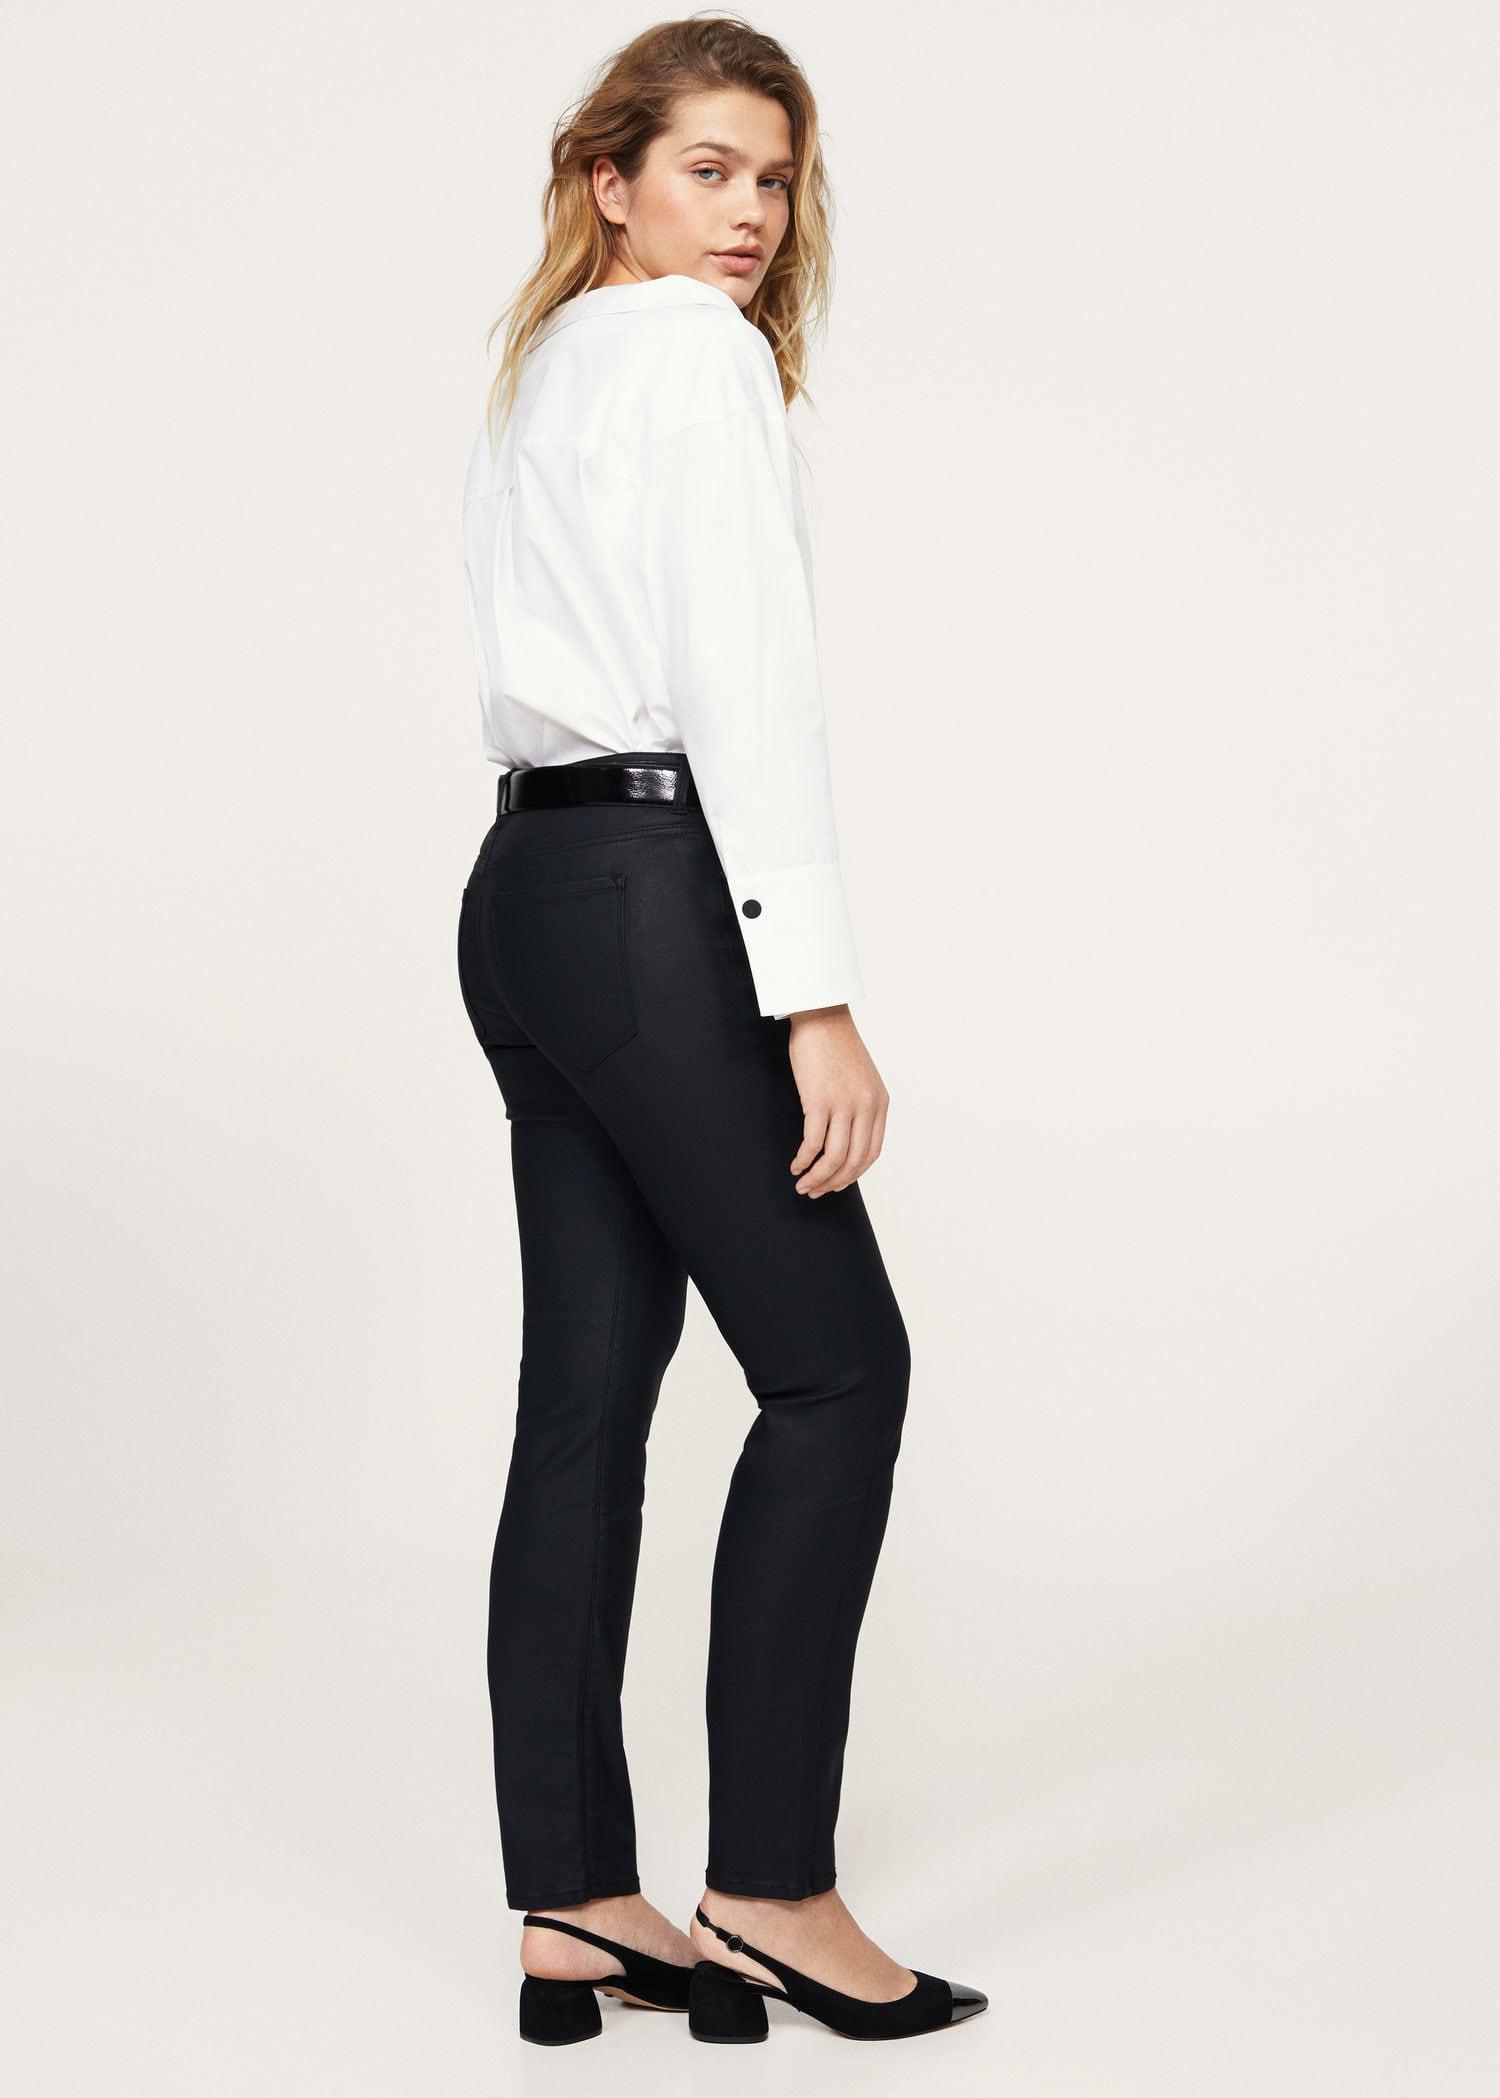 b89a6982f Violeta by Mango Black Coated Slim-fit Carmen Jeans